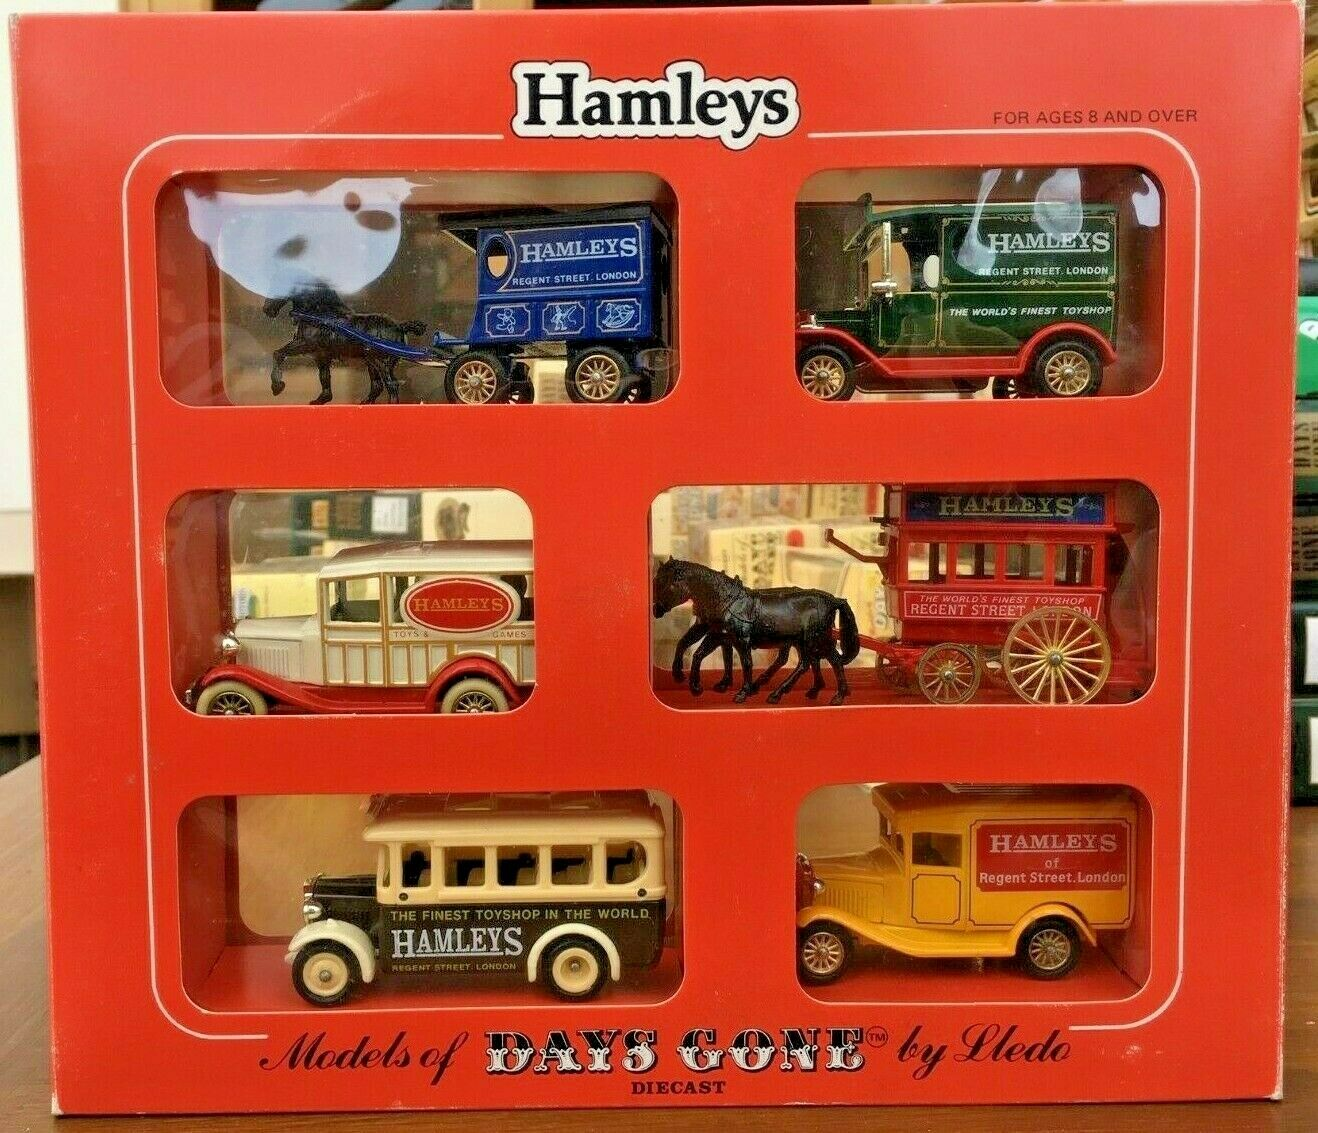 LLEDO DAYS GONE Hamleys Toyshop DG model sets HA1002 HA2002 HAL1004 & HA1006